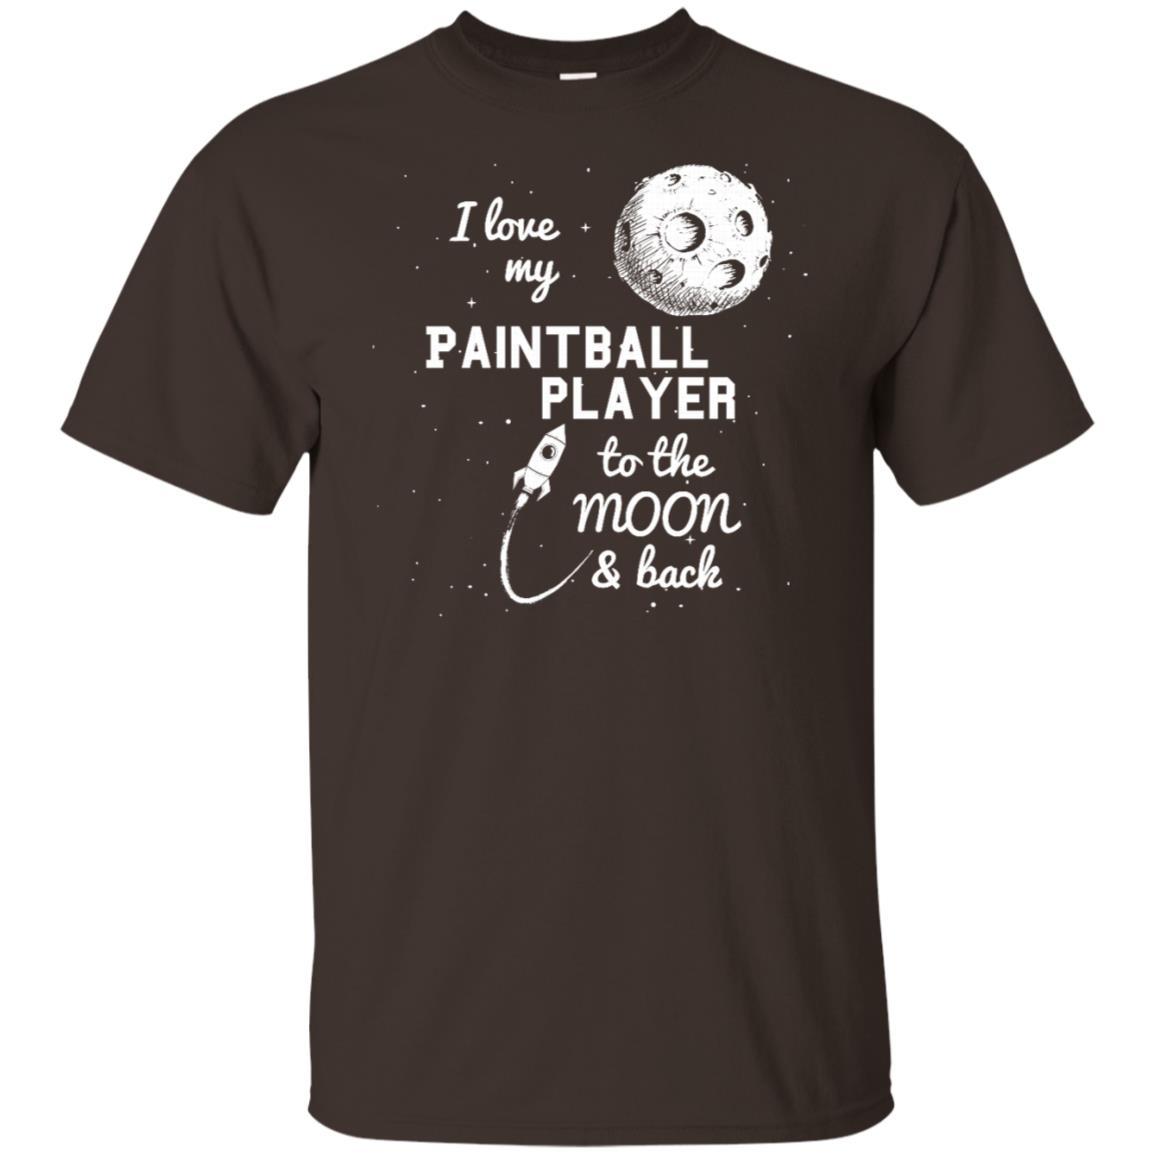 I Love My Paintball Player Unisex Short Sleeve